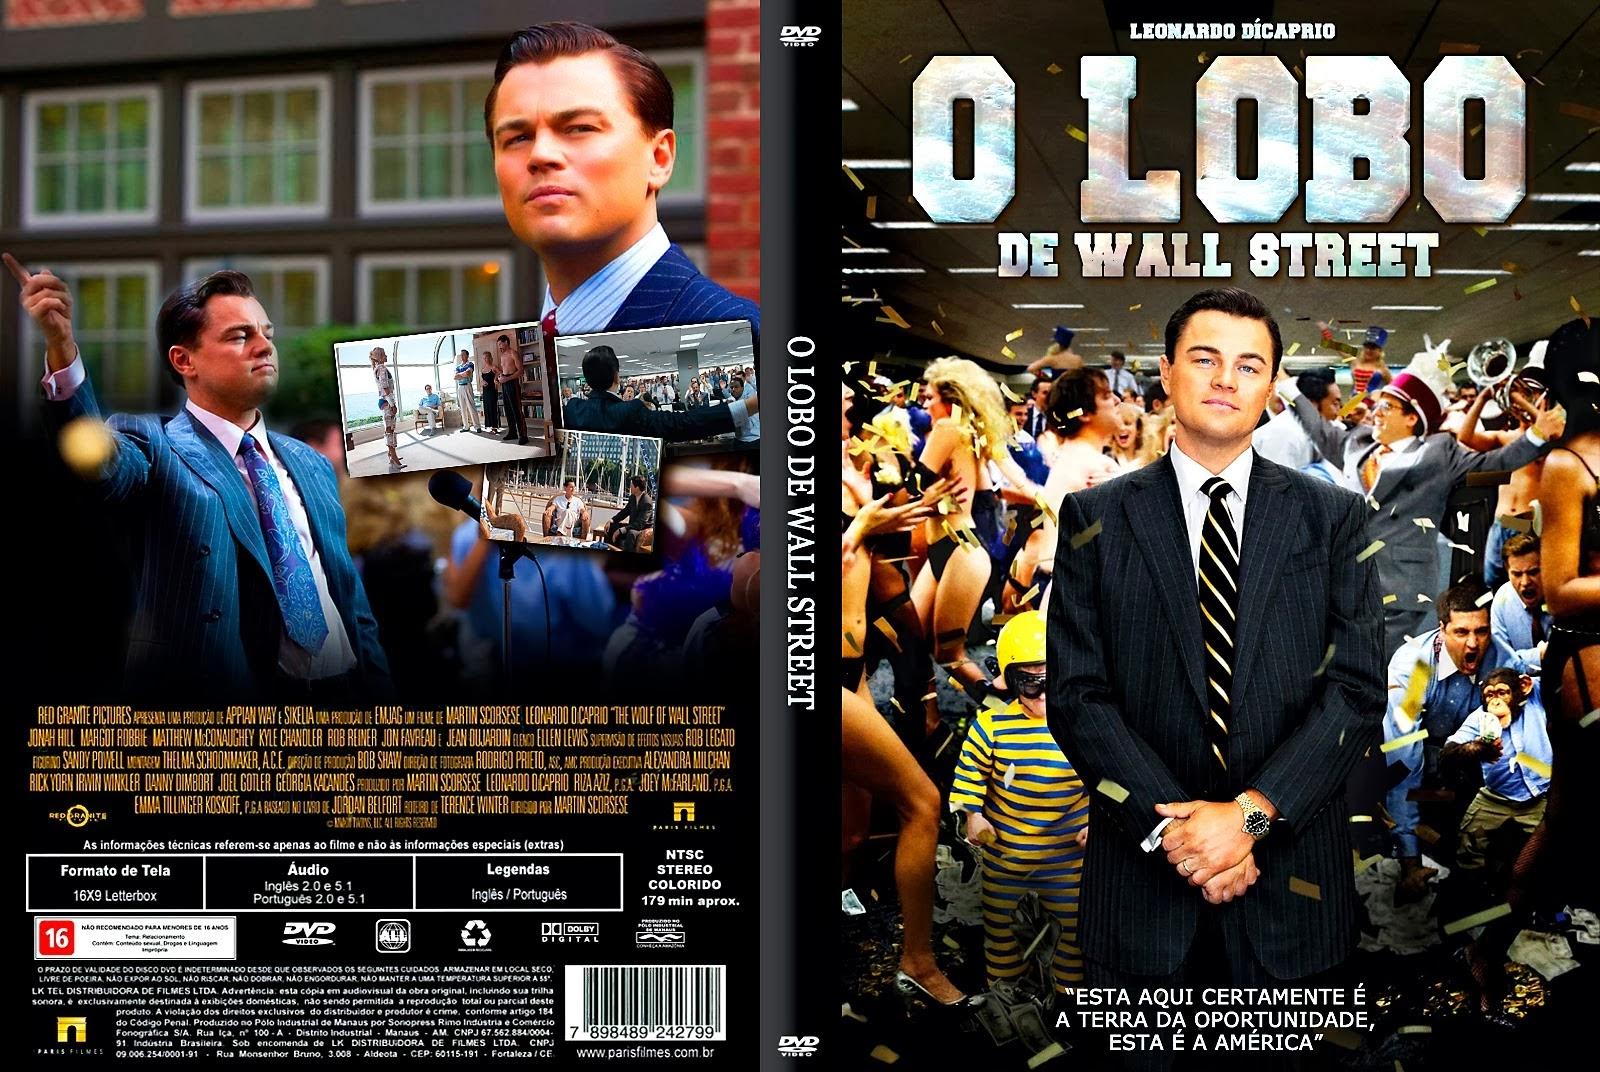 O Lobo de Wall Street BRRip 720p Dual Áudio O LOBO de wall street